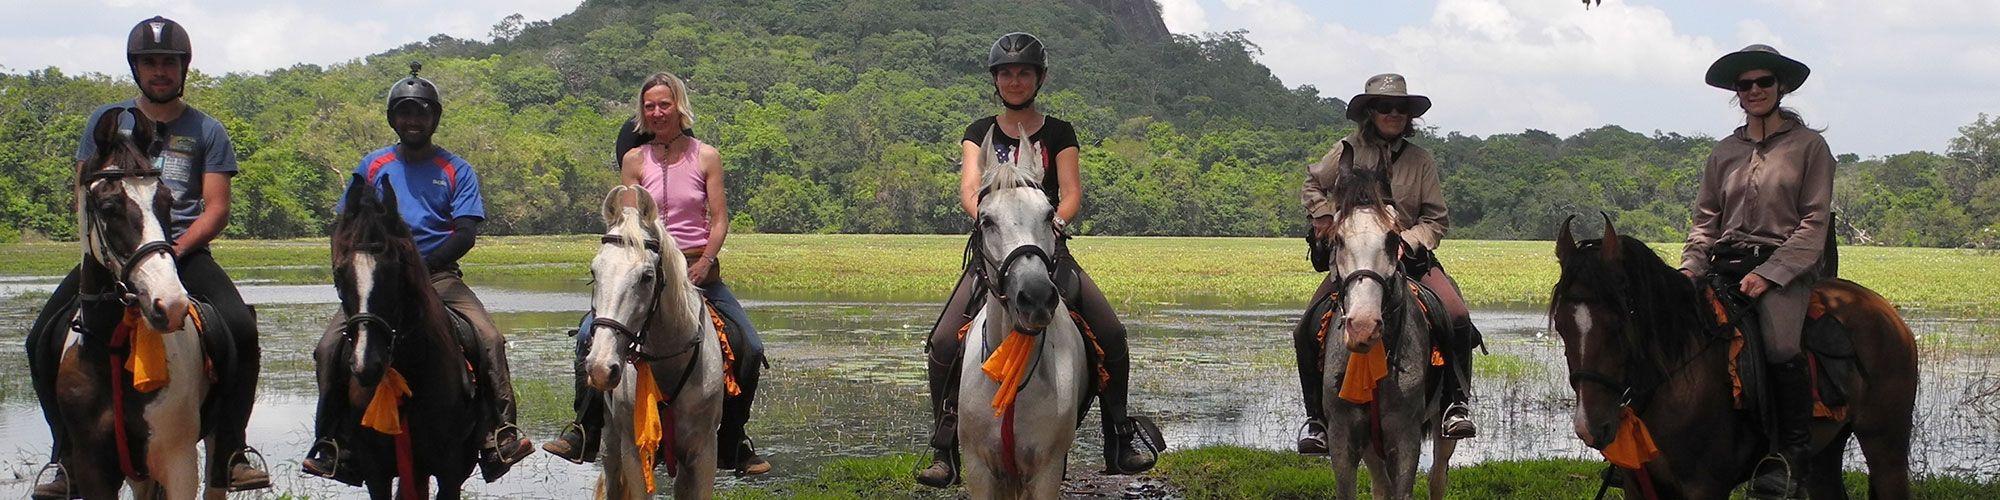 Horseriders, Sigiriya, Sri Lanka